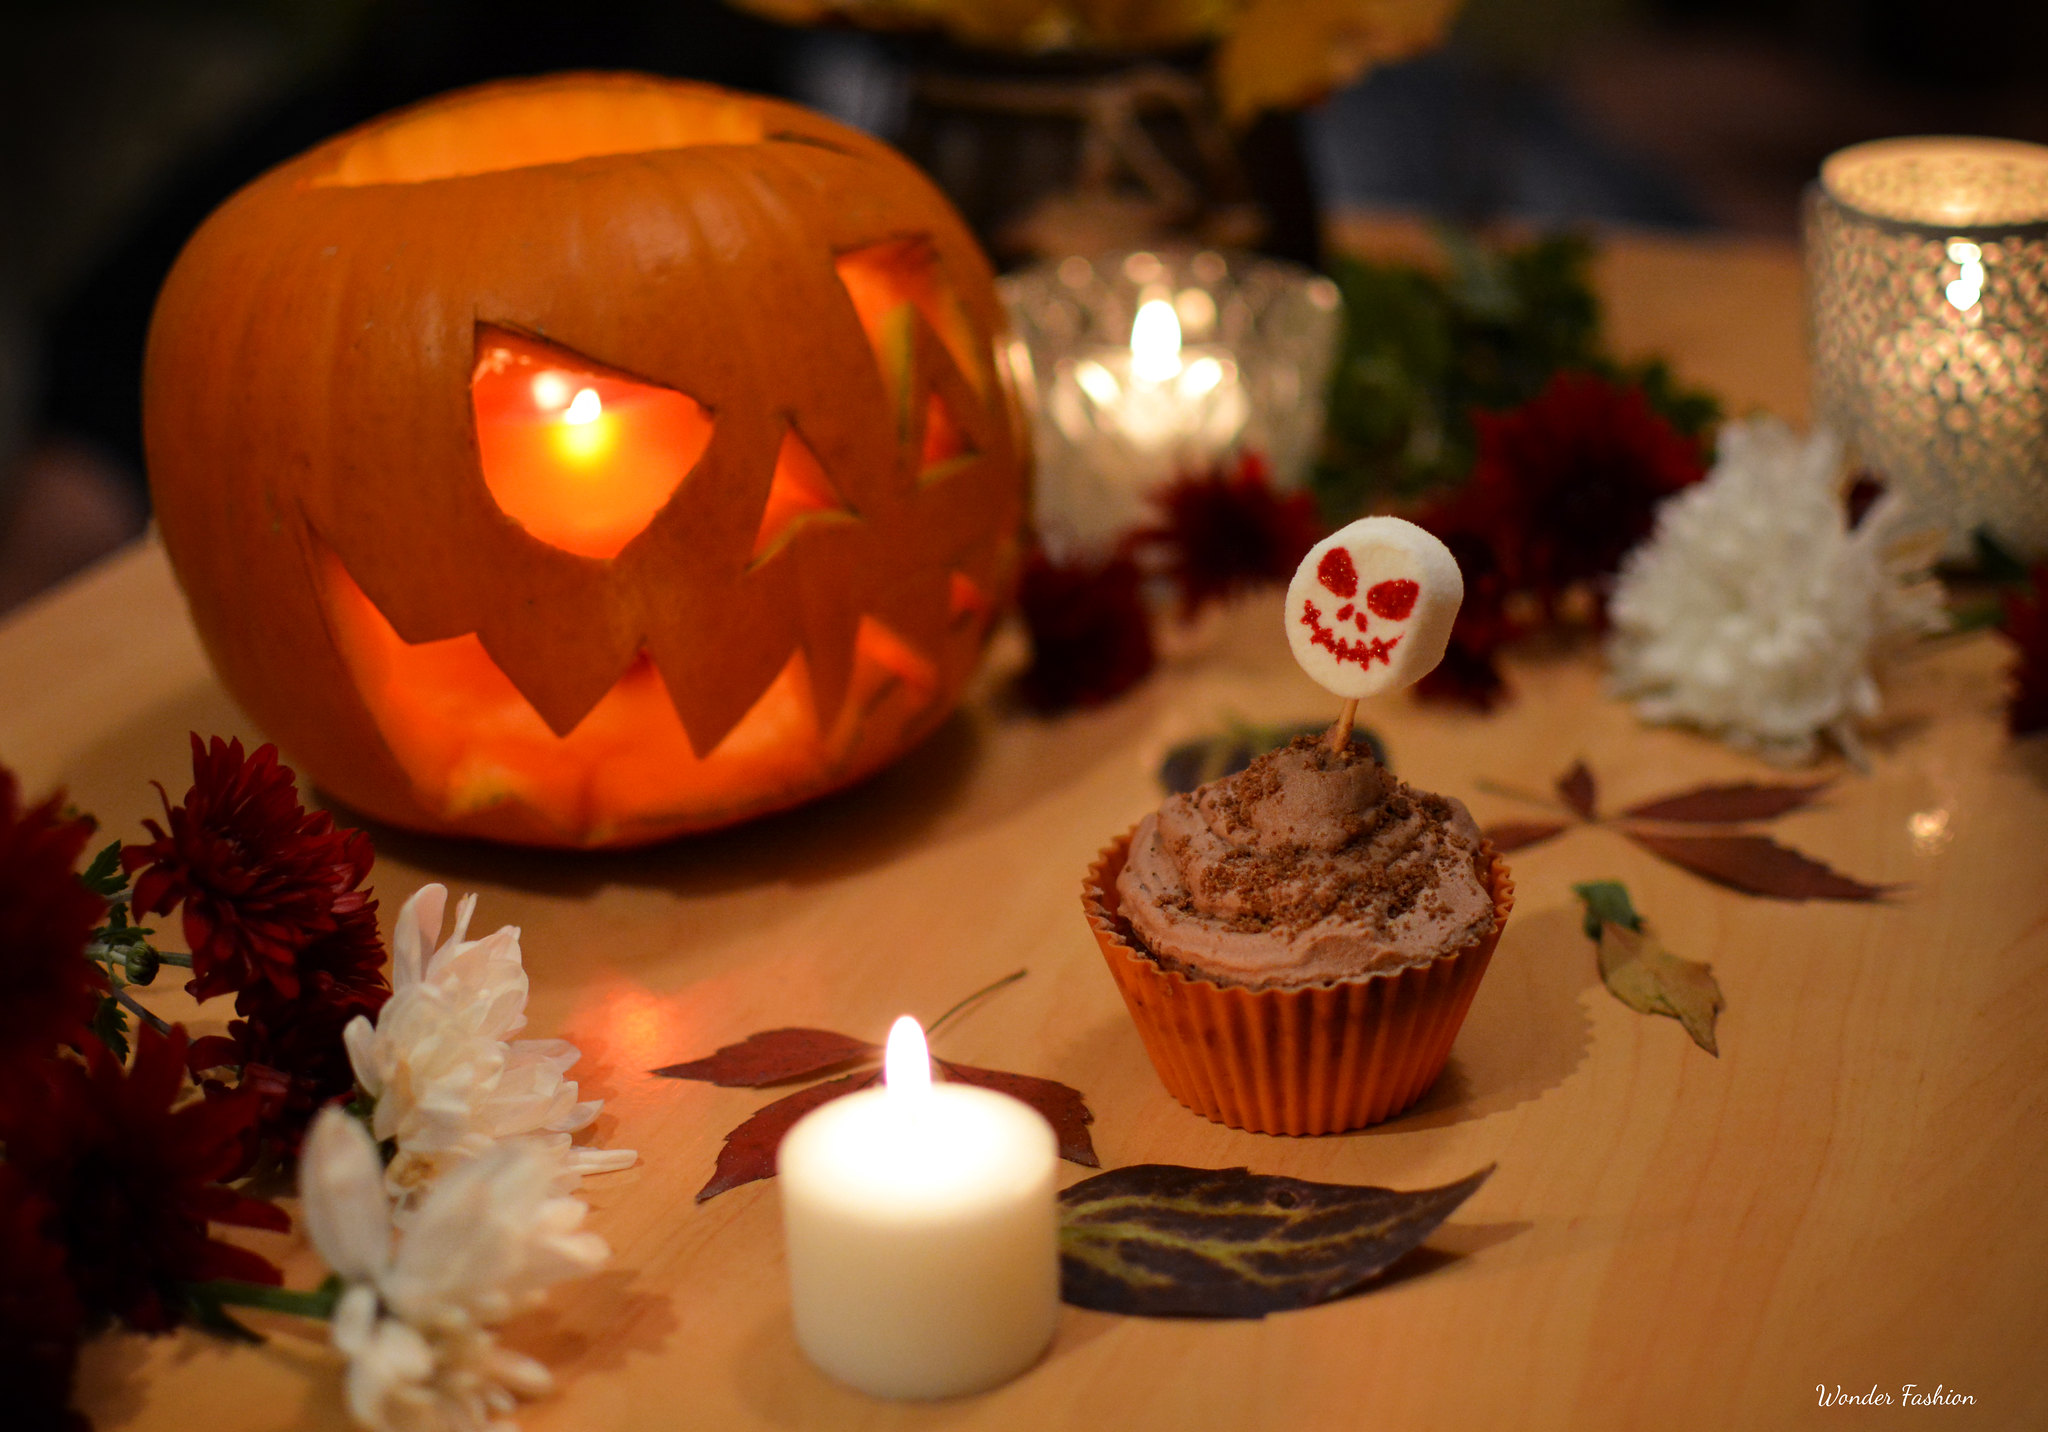 The sweetest Halloween